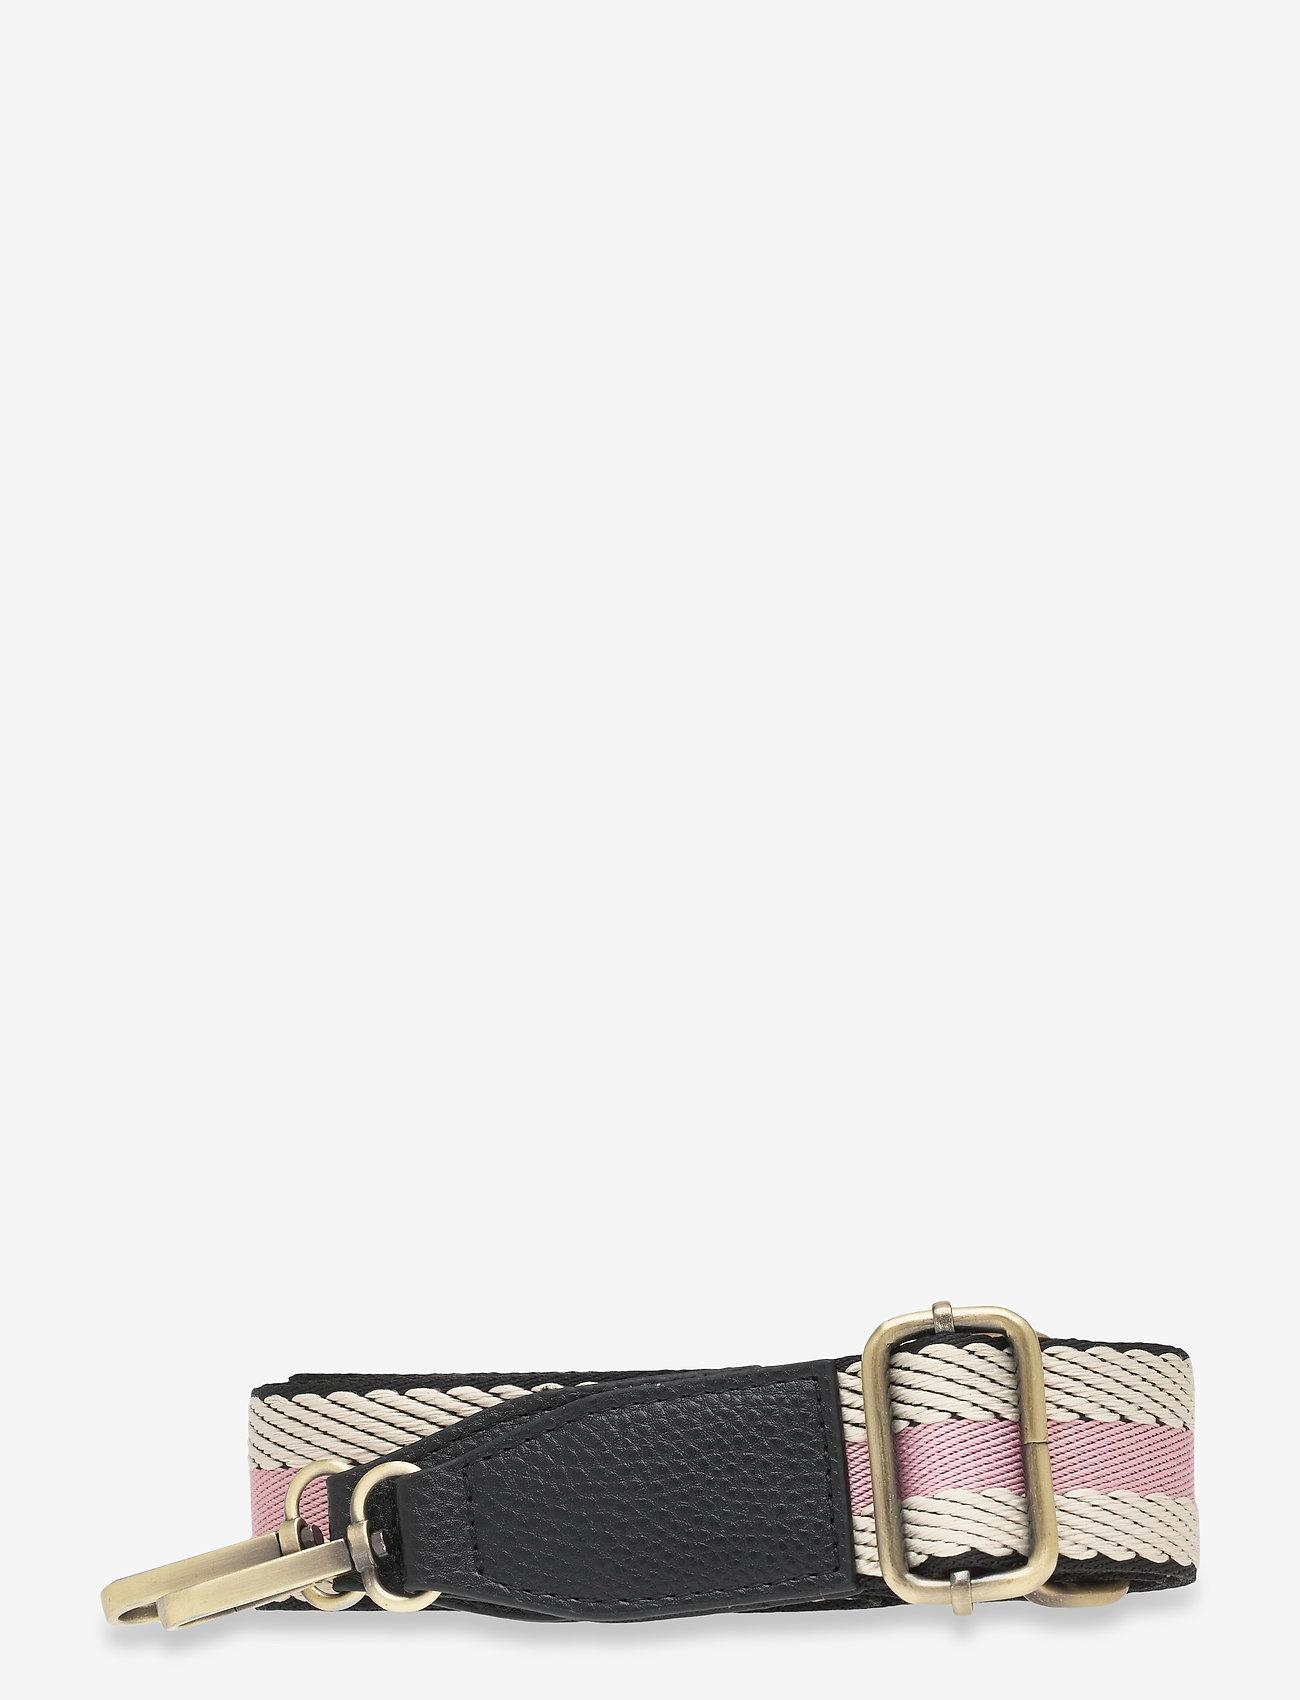 PIPOL'S BAZAAR - Strap Joia Pink - sale - multi - 0